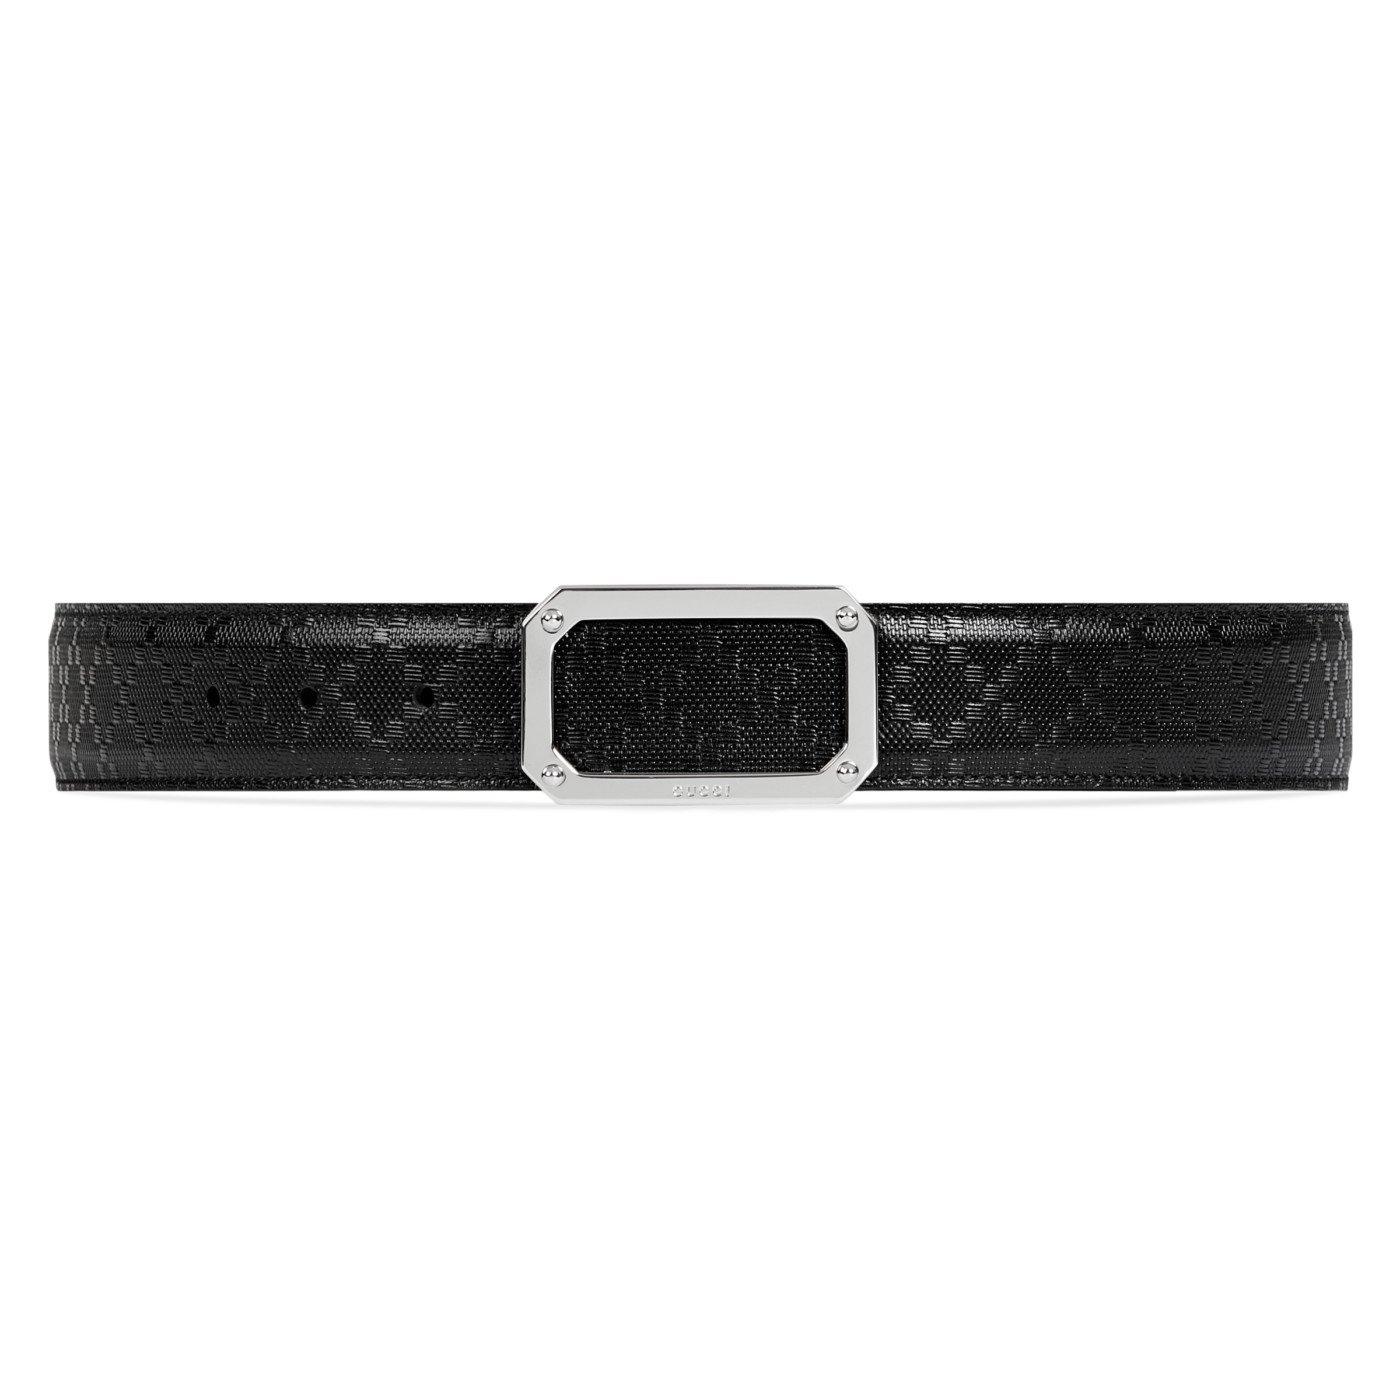 e960a6e08d2dca Top3: Gucci GG Black Diamante Leather Square Rectangular Belt